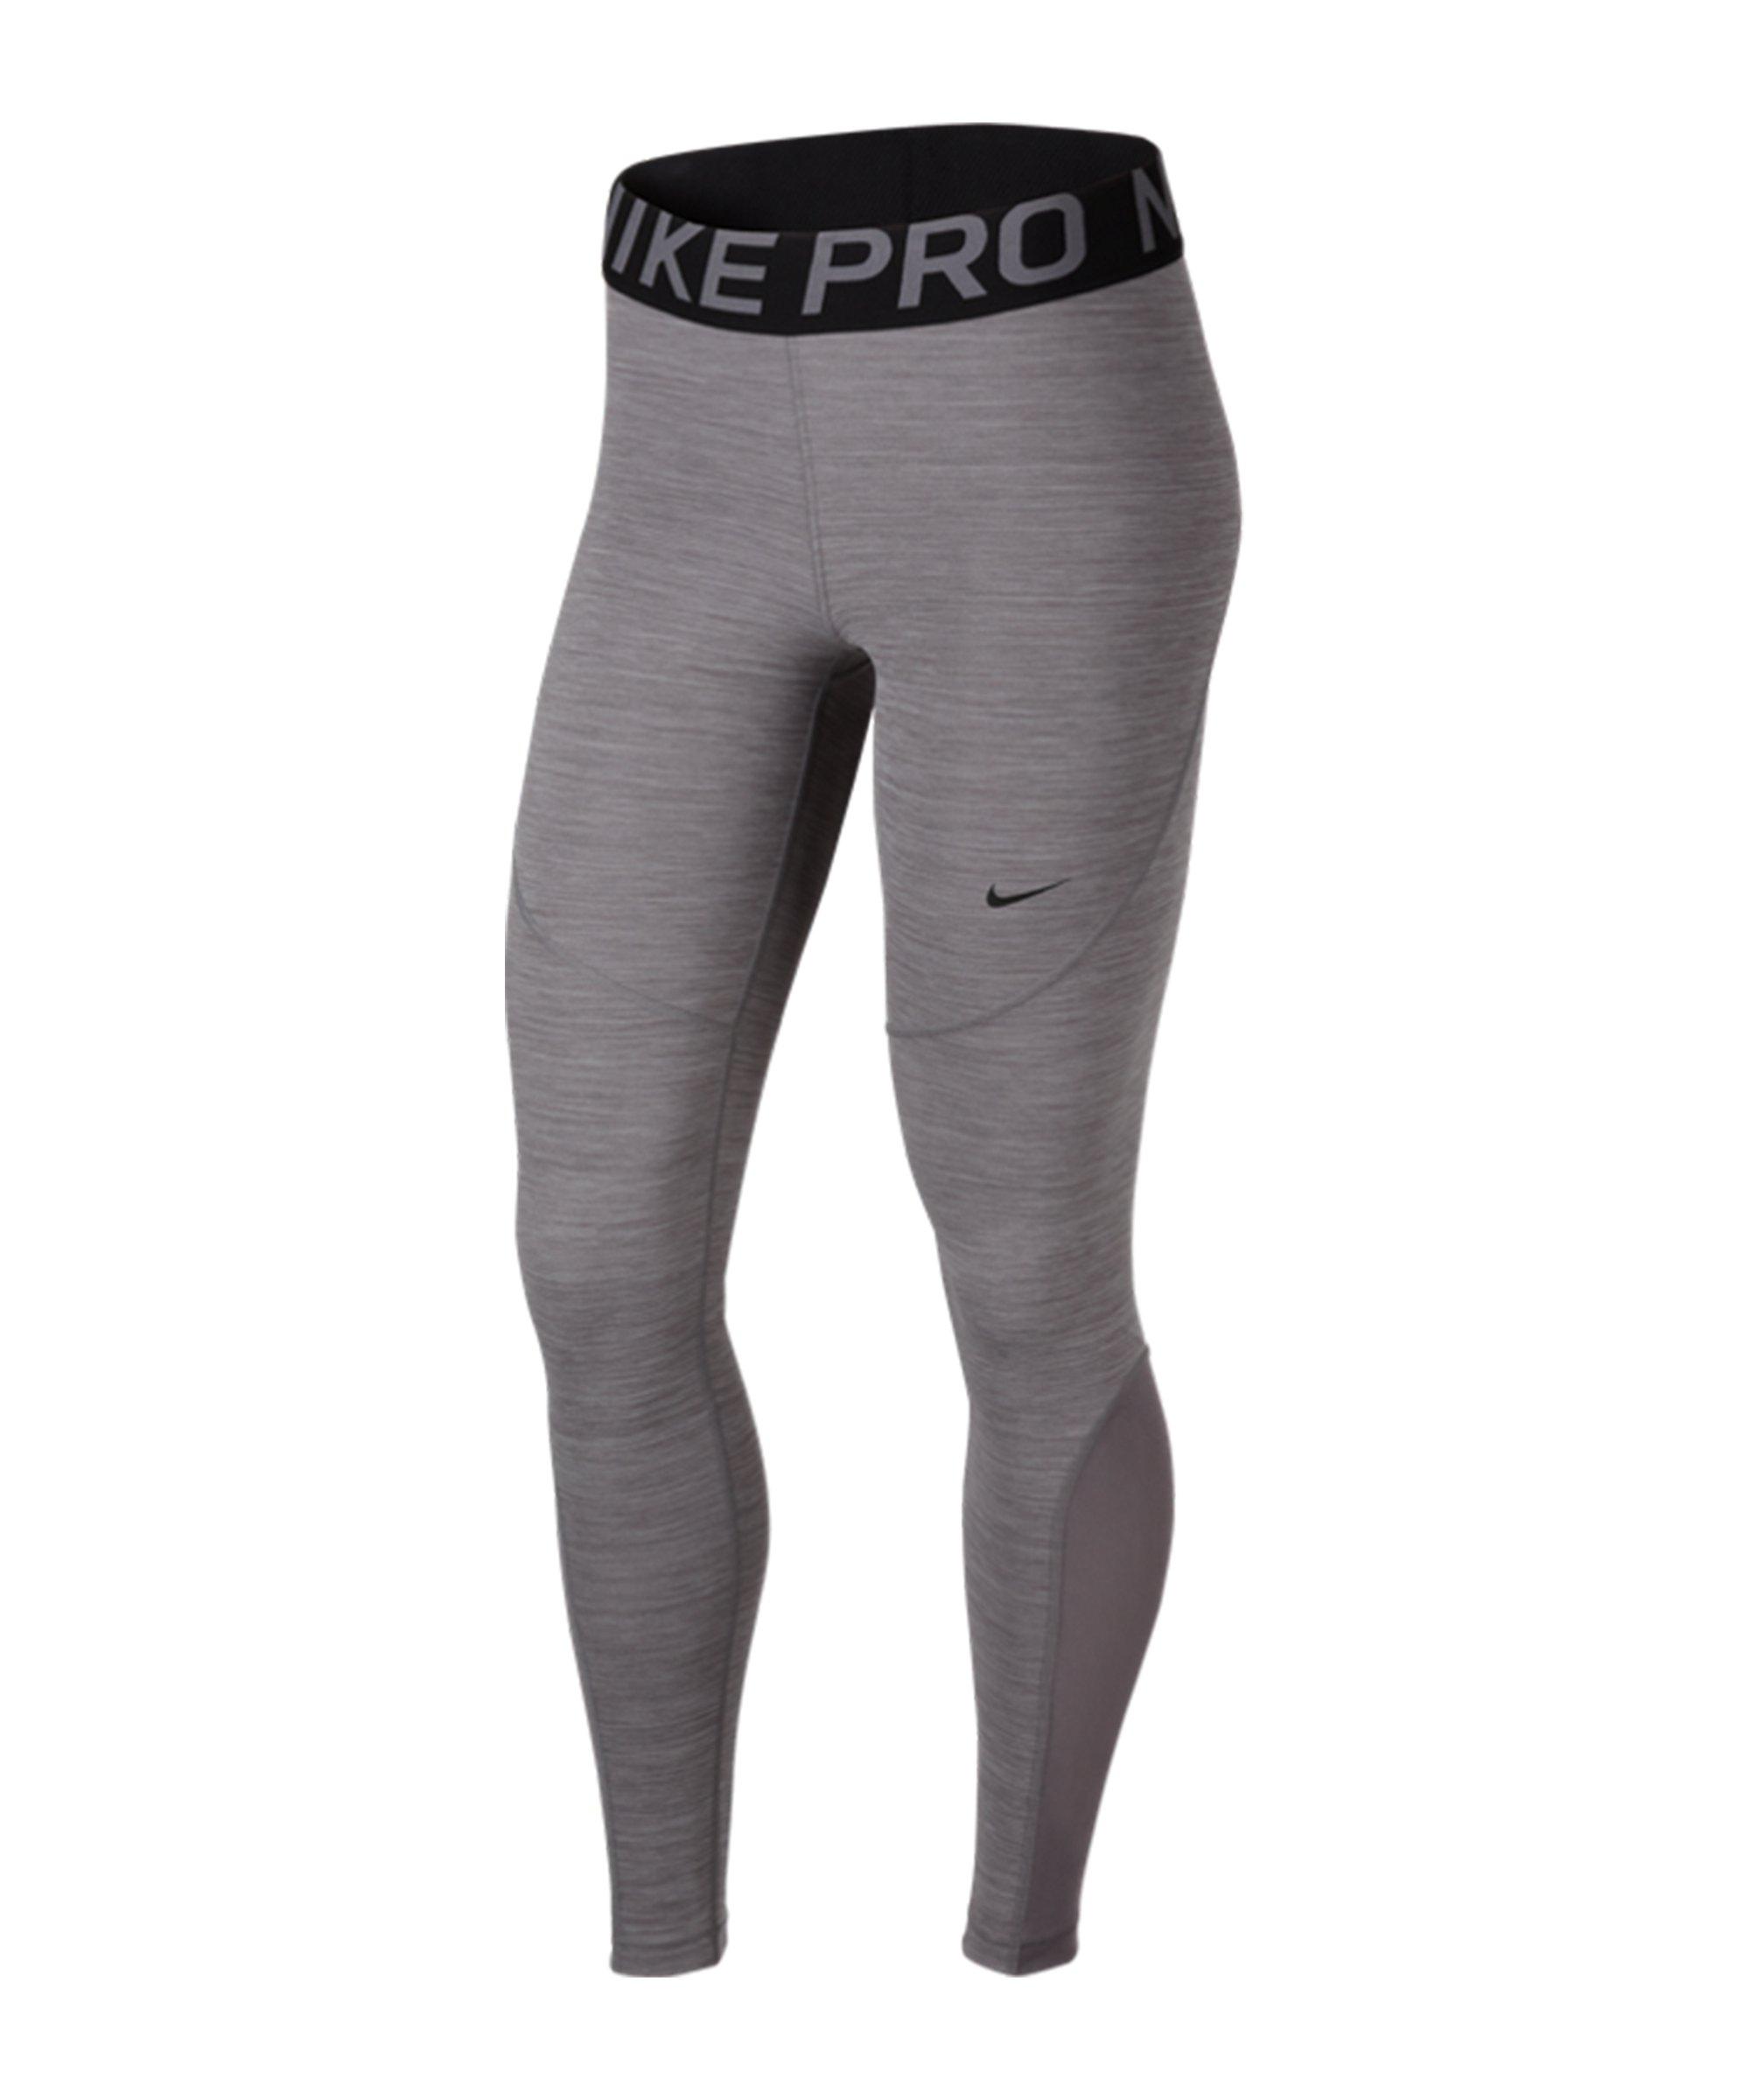 Nike Pro Tights Leggings Damen Grau Schwarz F063 - grau